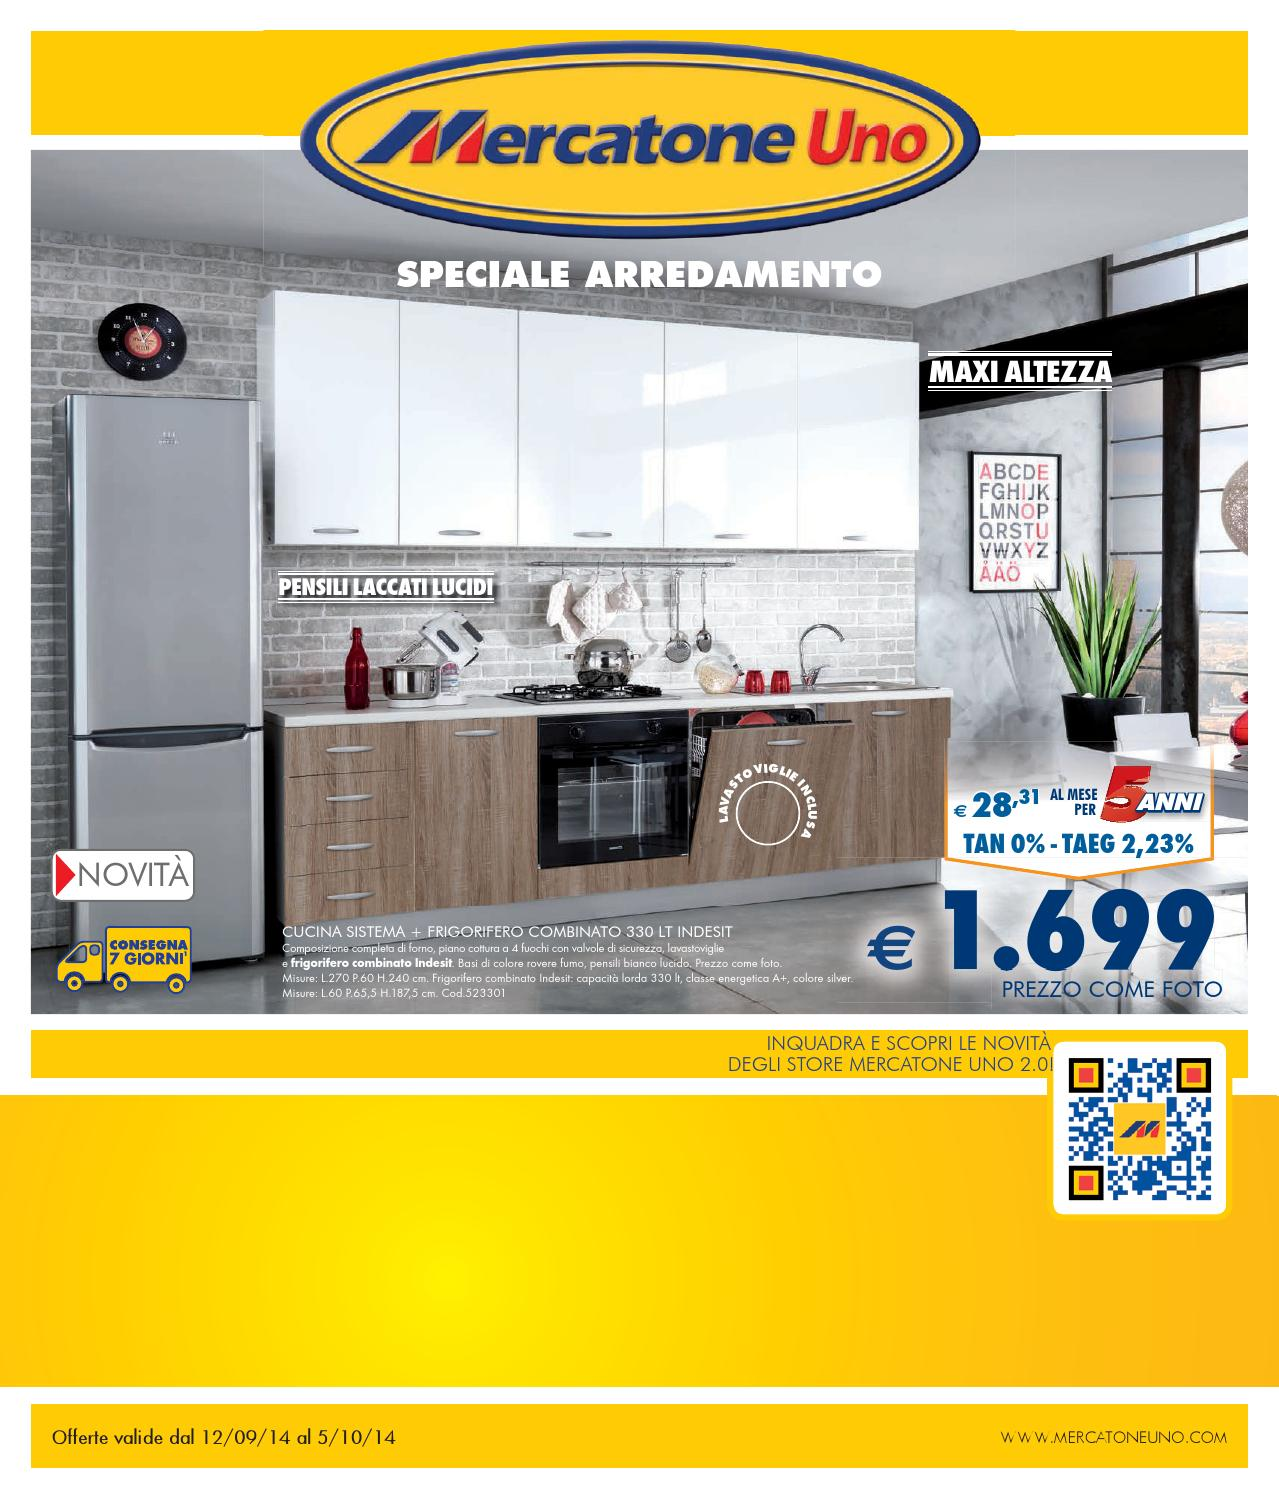 Mercatone uno 5 anni by mobilpro issuu for Sedie cucina mercatone uno